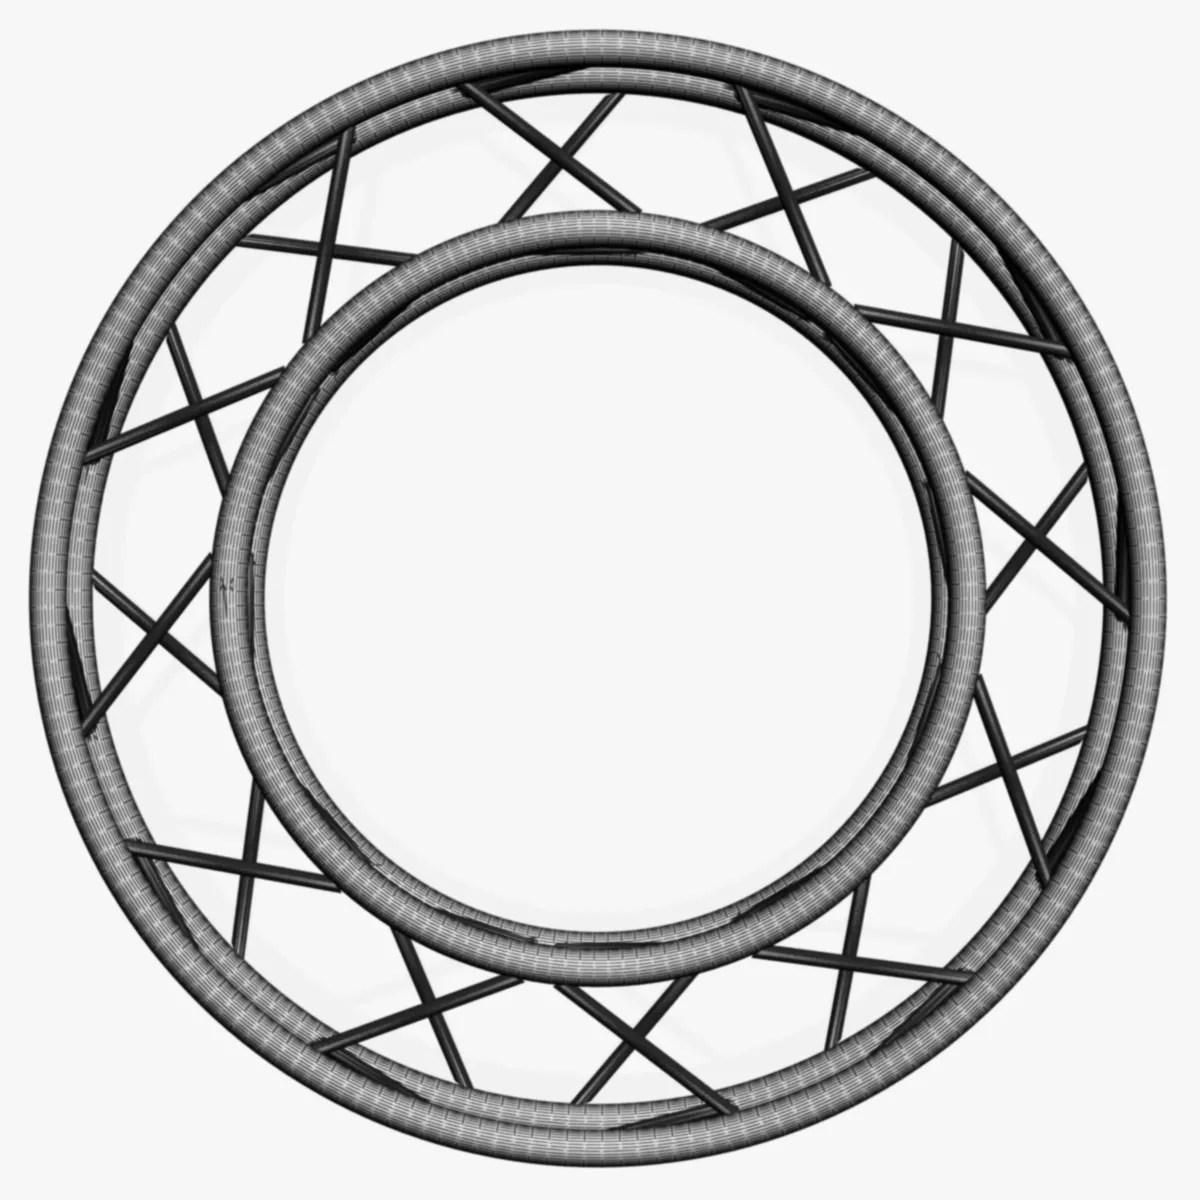 Circle Square Truss Full Diameter 150cm 3d Model